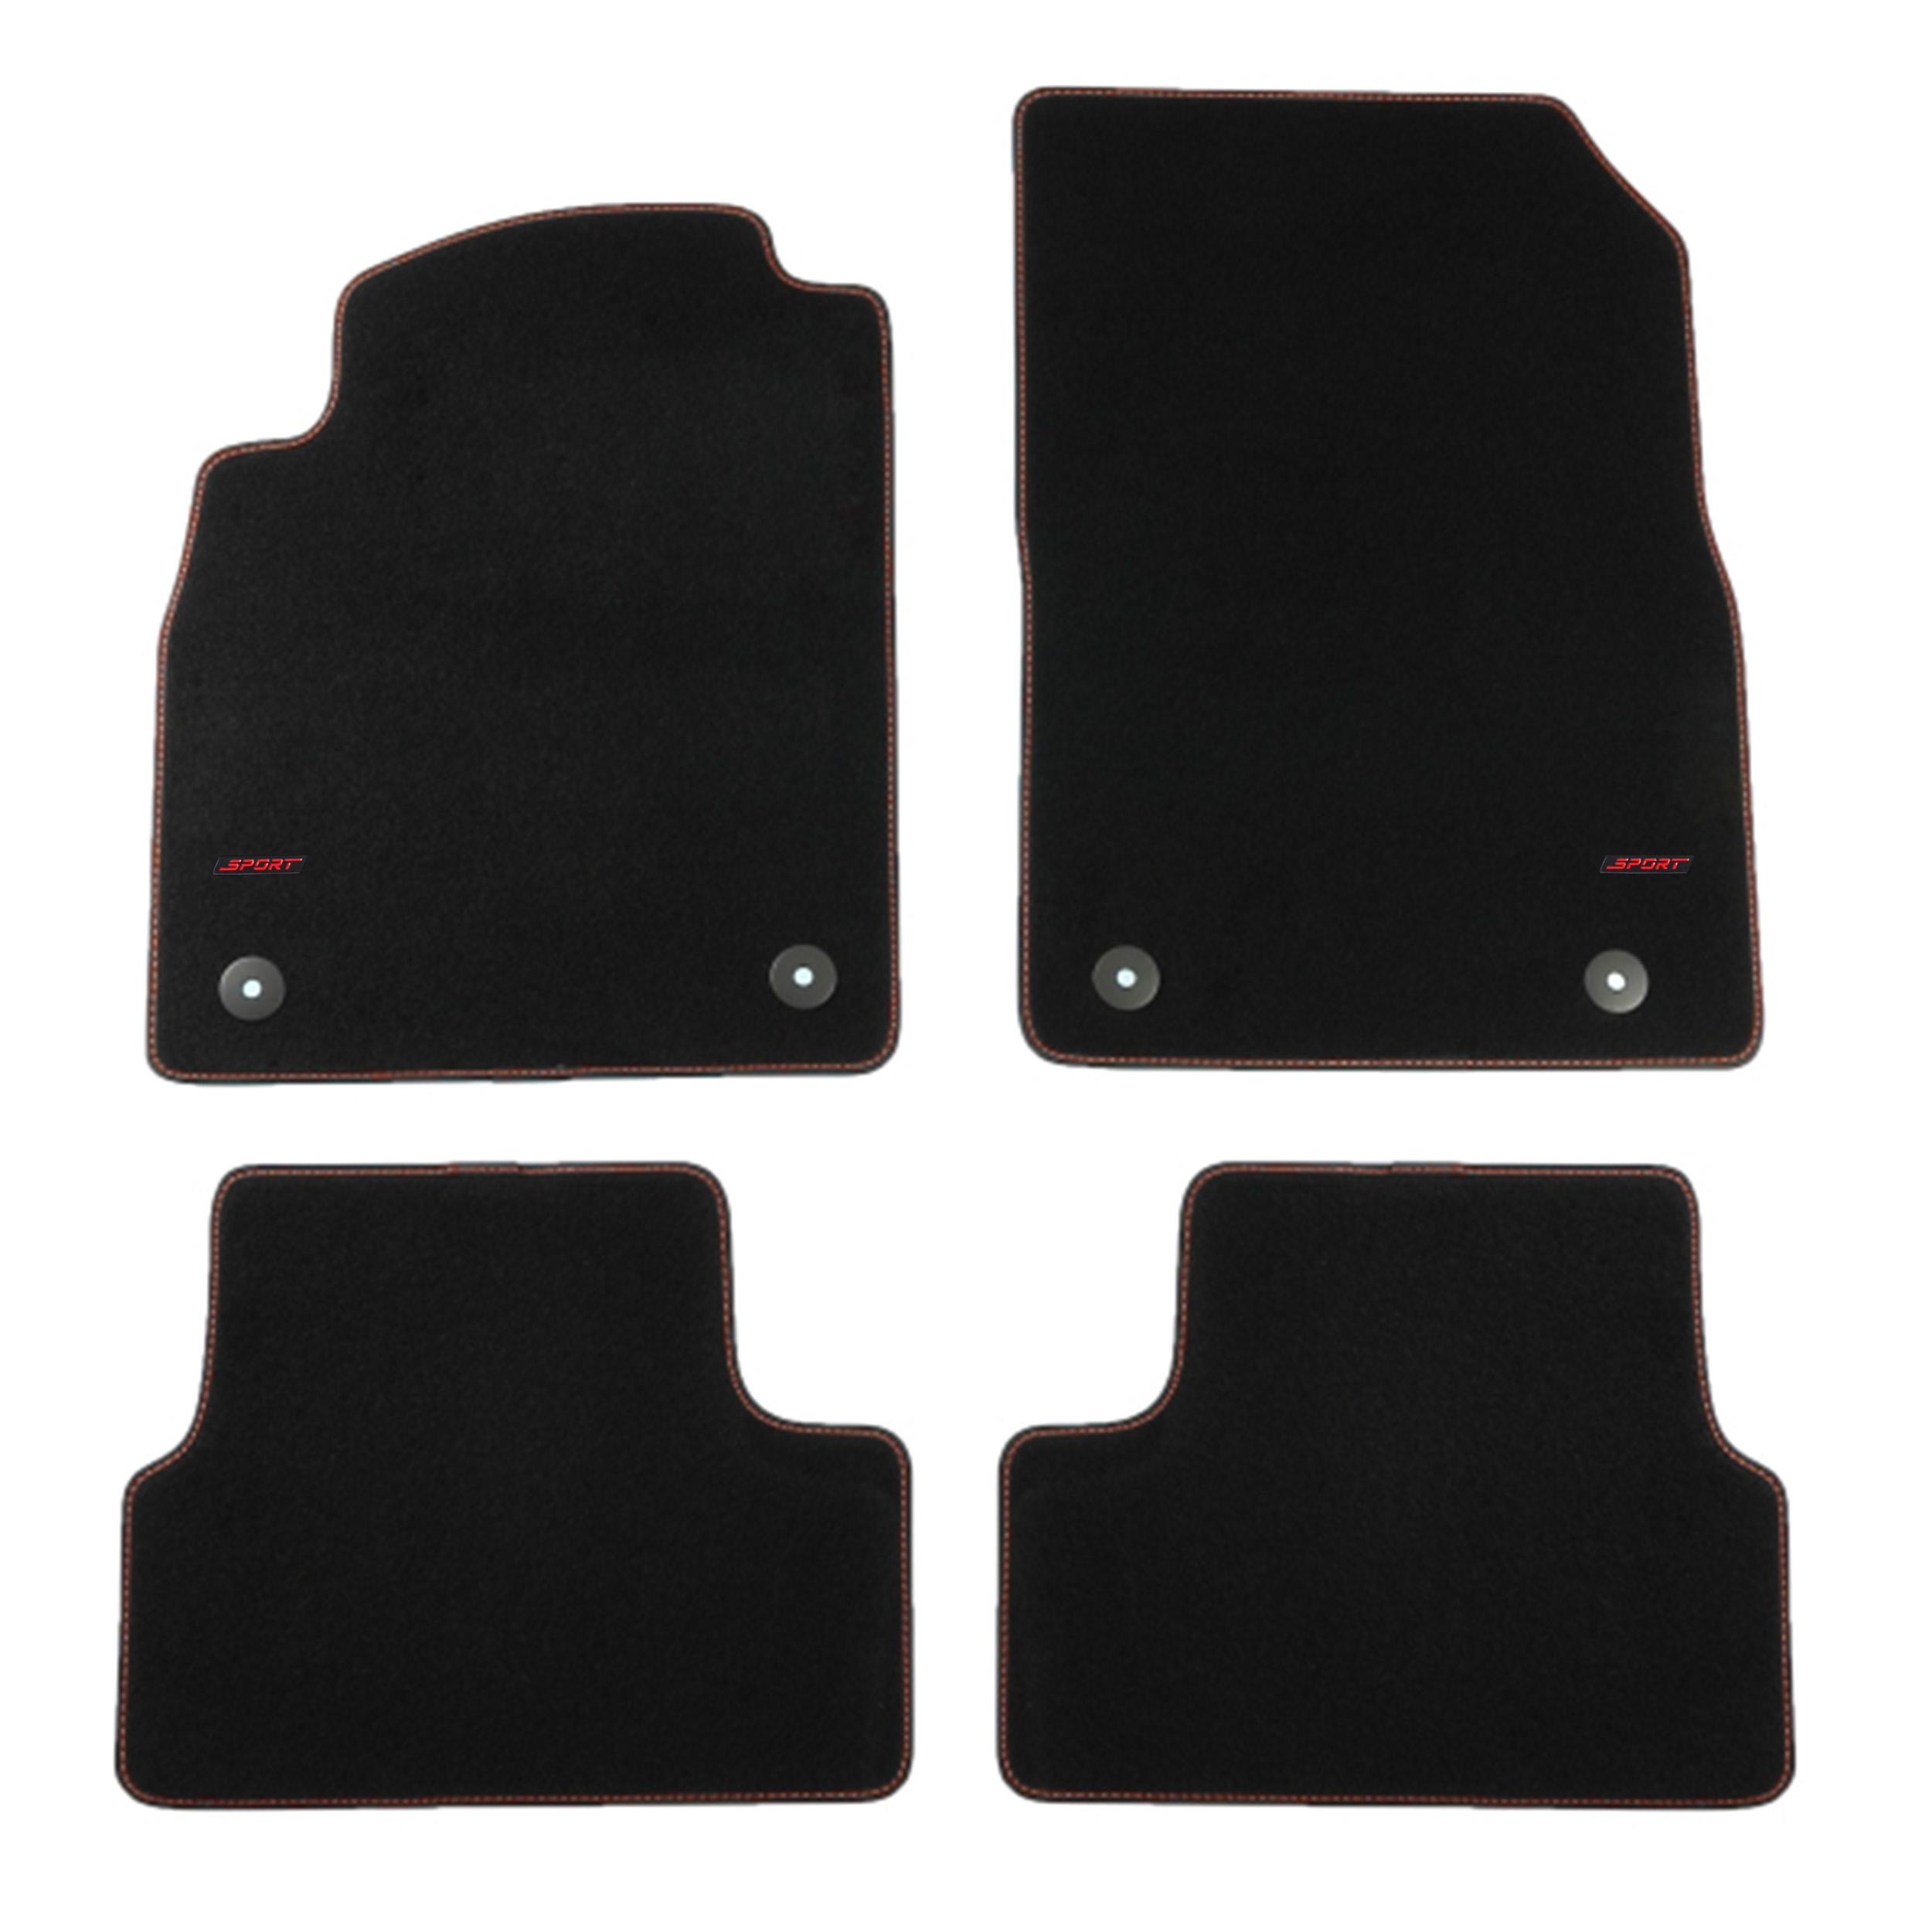 opel astra iv j bj 2009 sport fu matten autoteppiche ebay. Black Bedroom Furniture Sets. Home Design Ideas